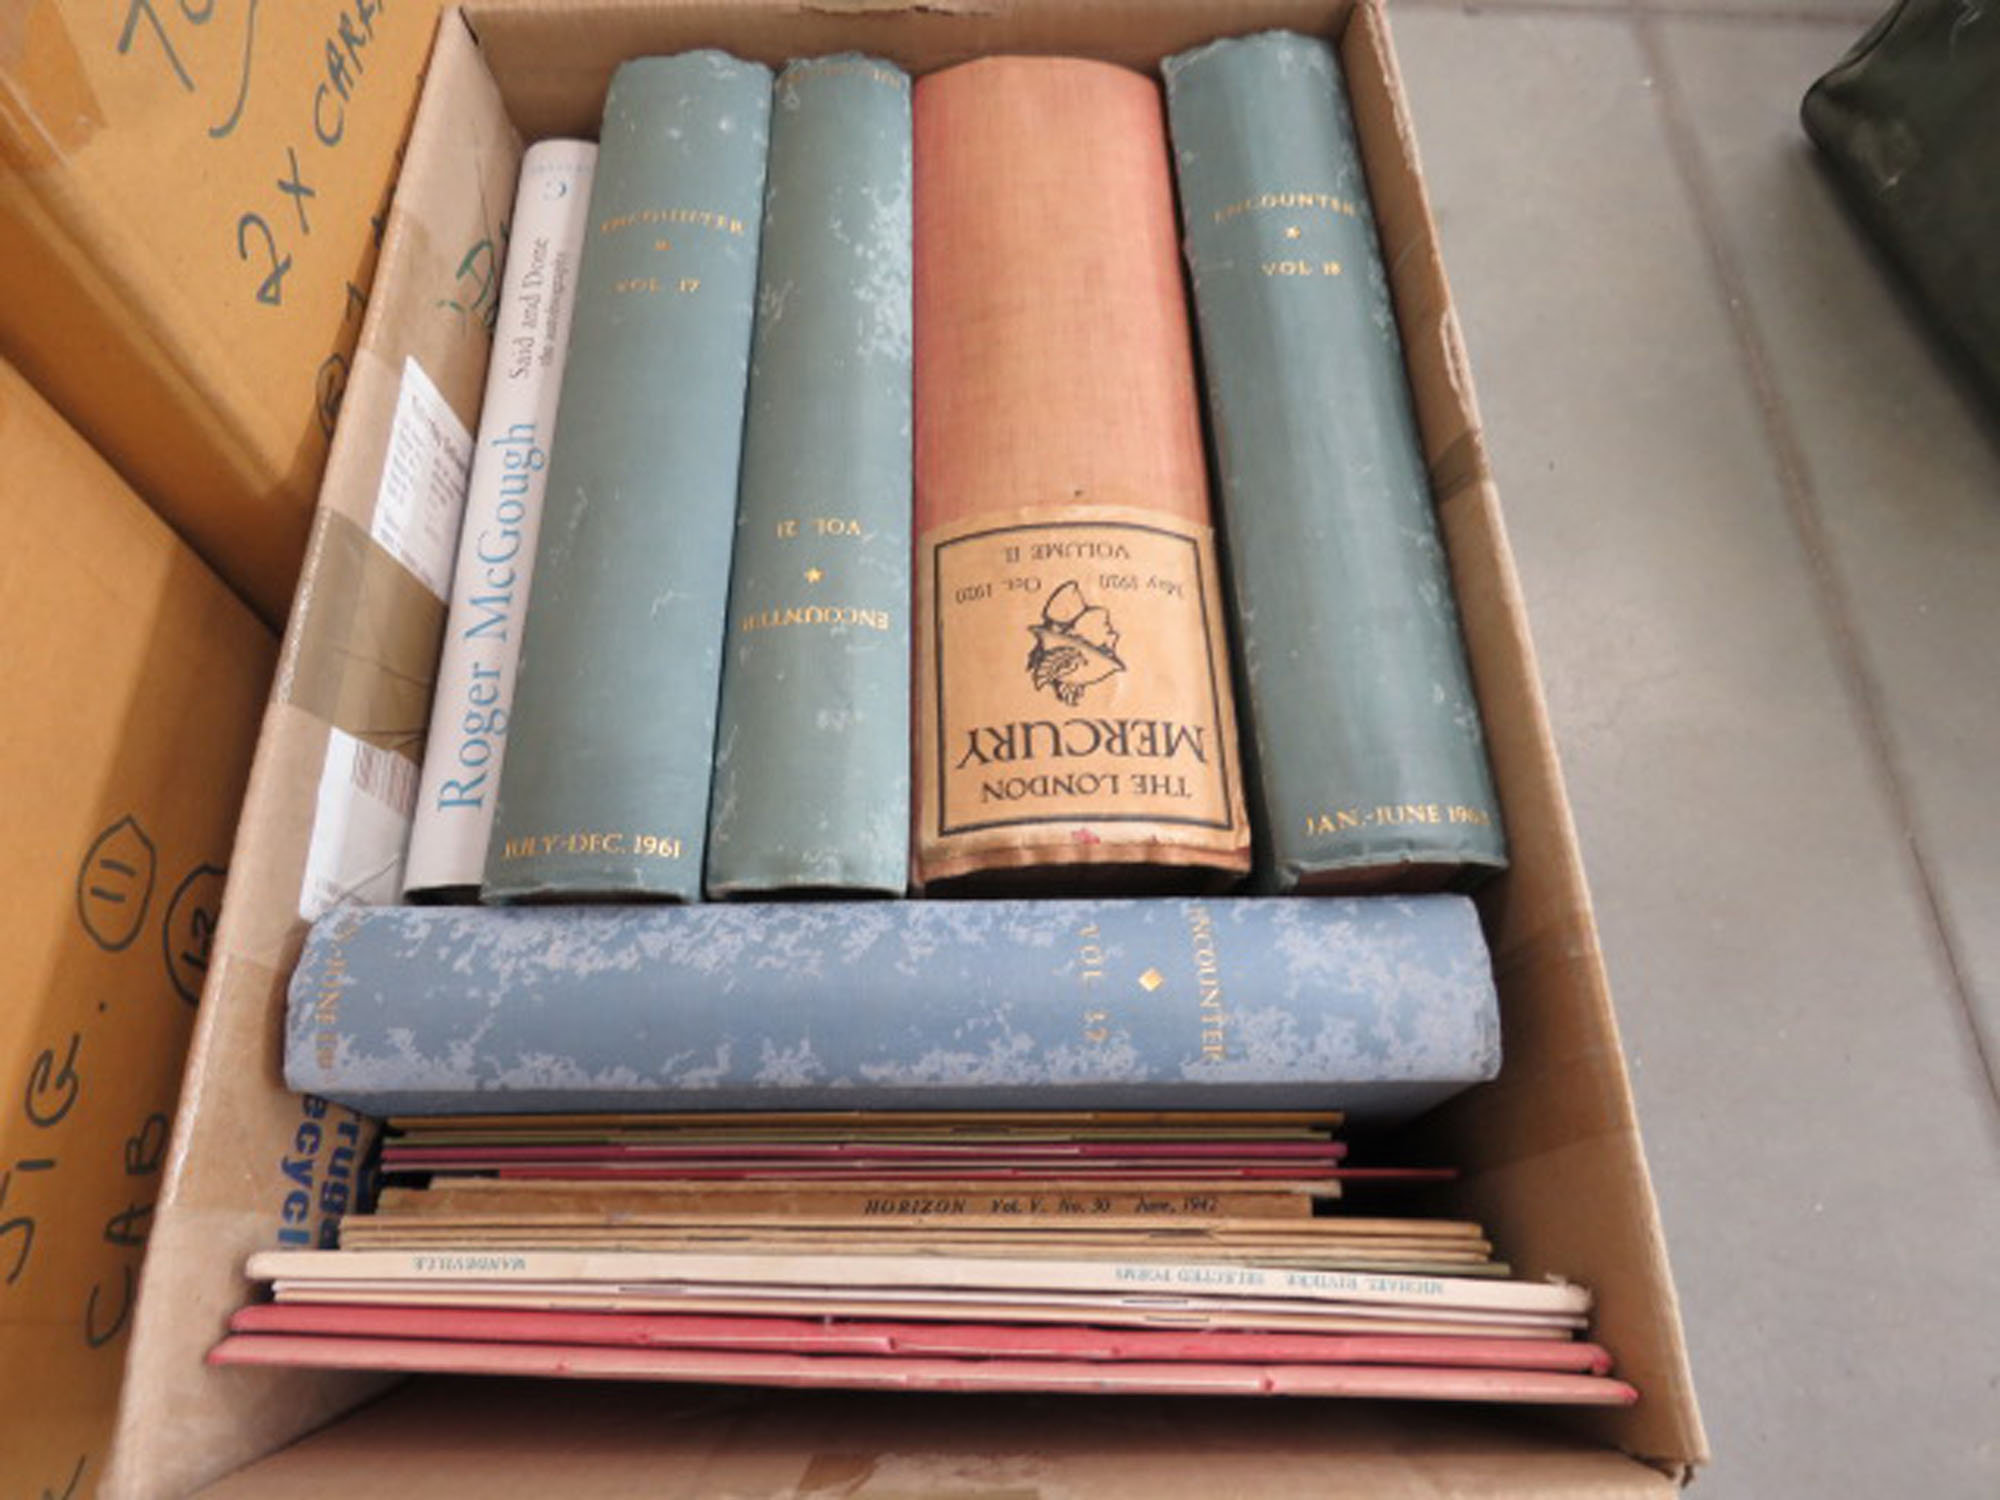 Box containing horizon magazines plus volume 2 of The London Mercury and Biography